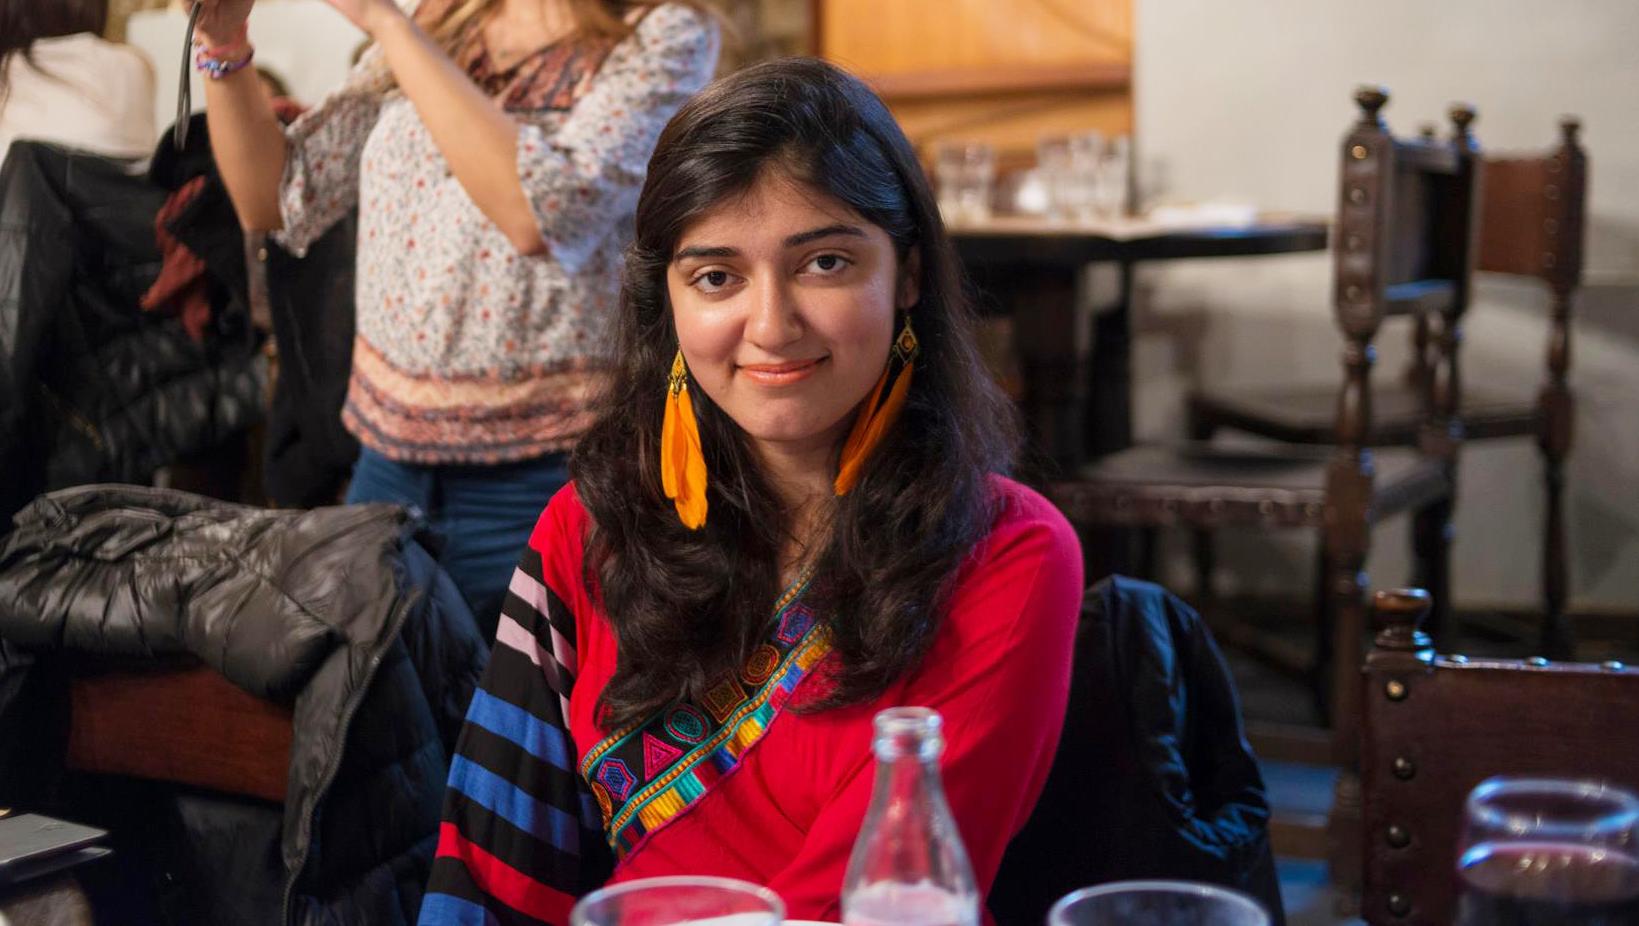 Hina, Abdullah Gül University Student from Islamabad-Pakistan